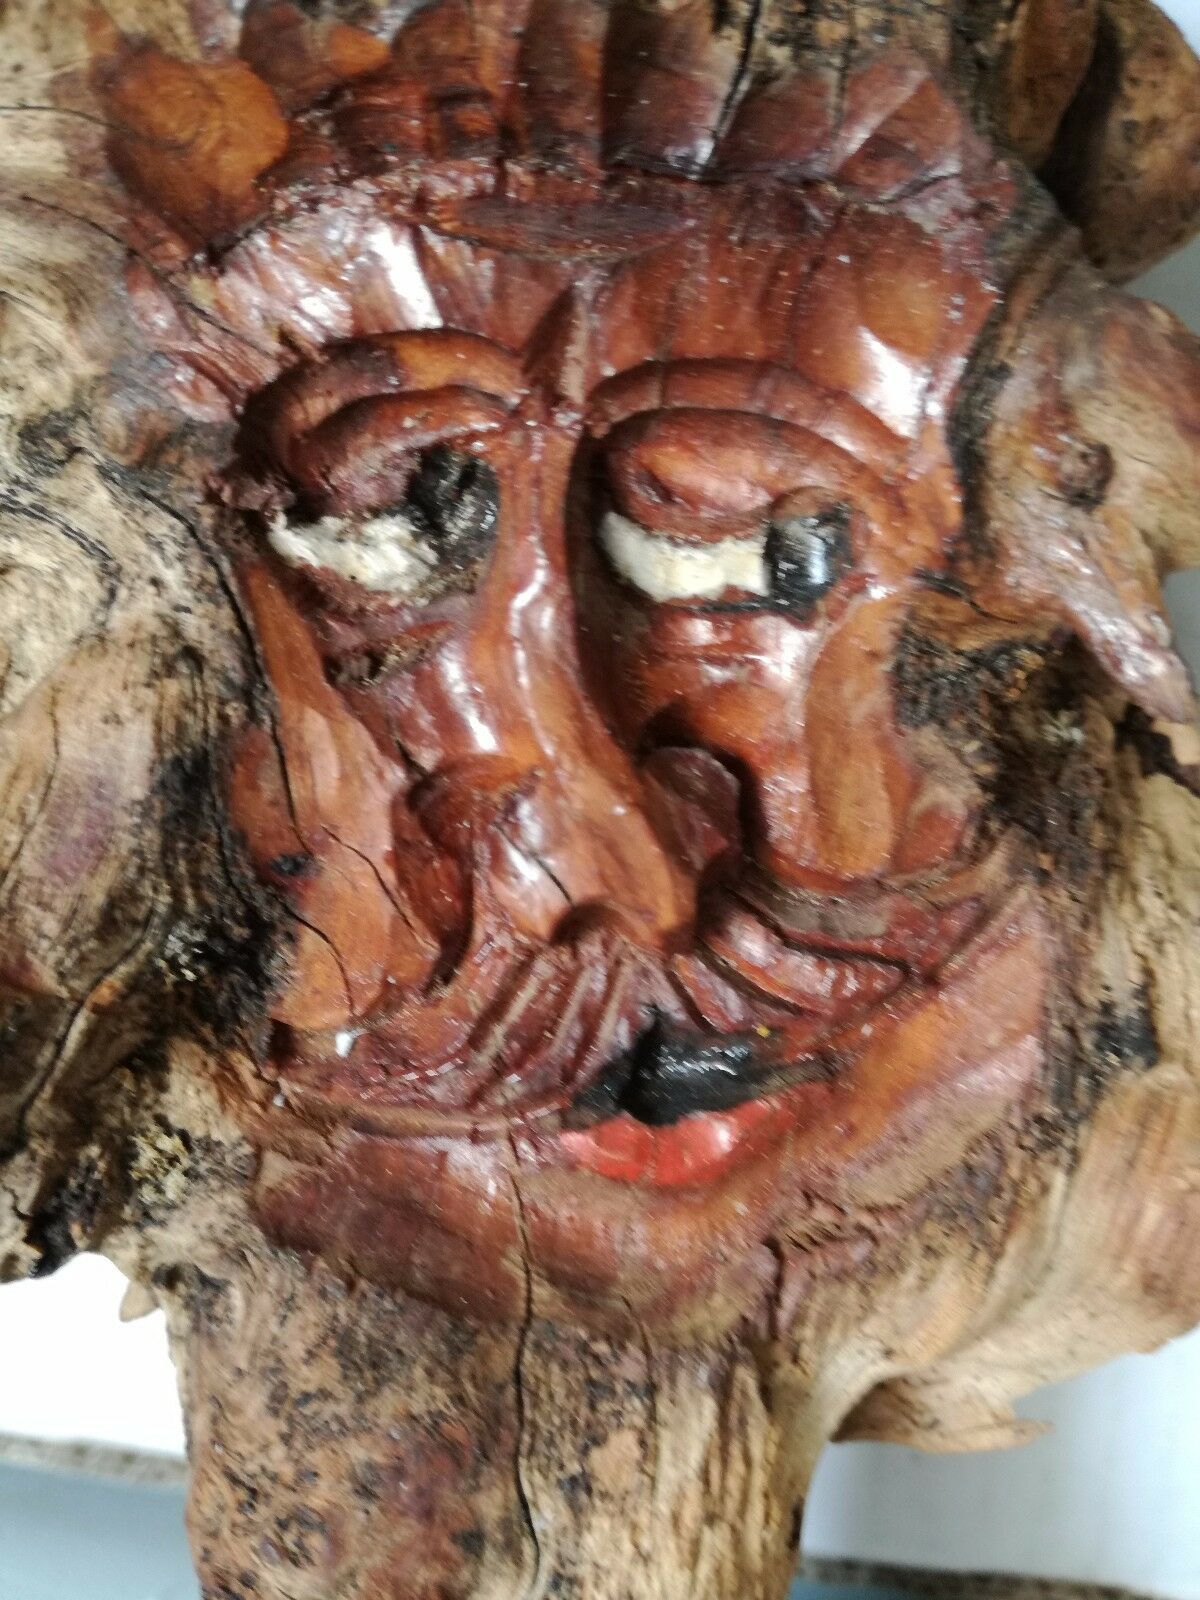 Antique Black Forest HandCarved Wooden German Root face Hobbit Gnome deco image 3